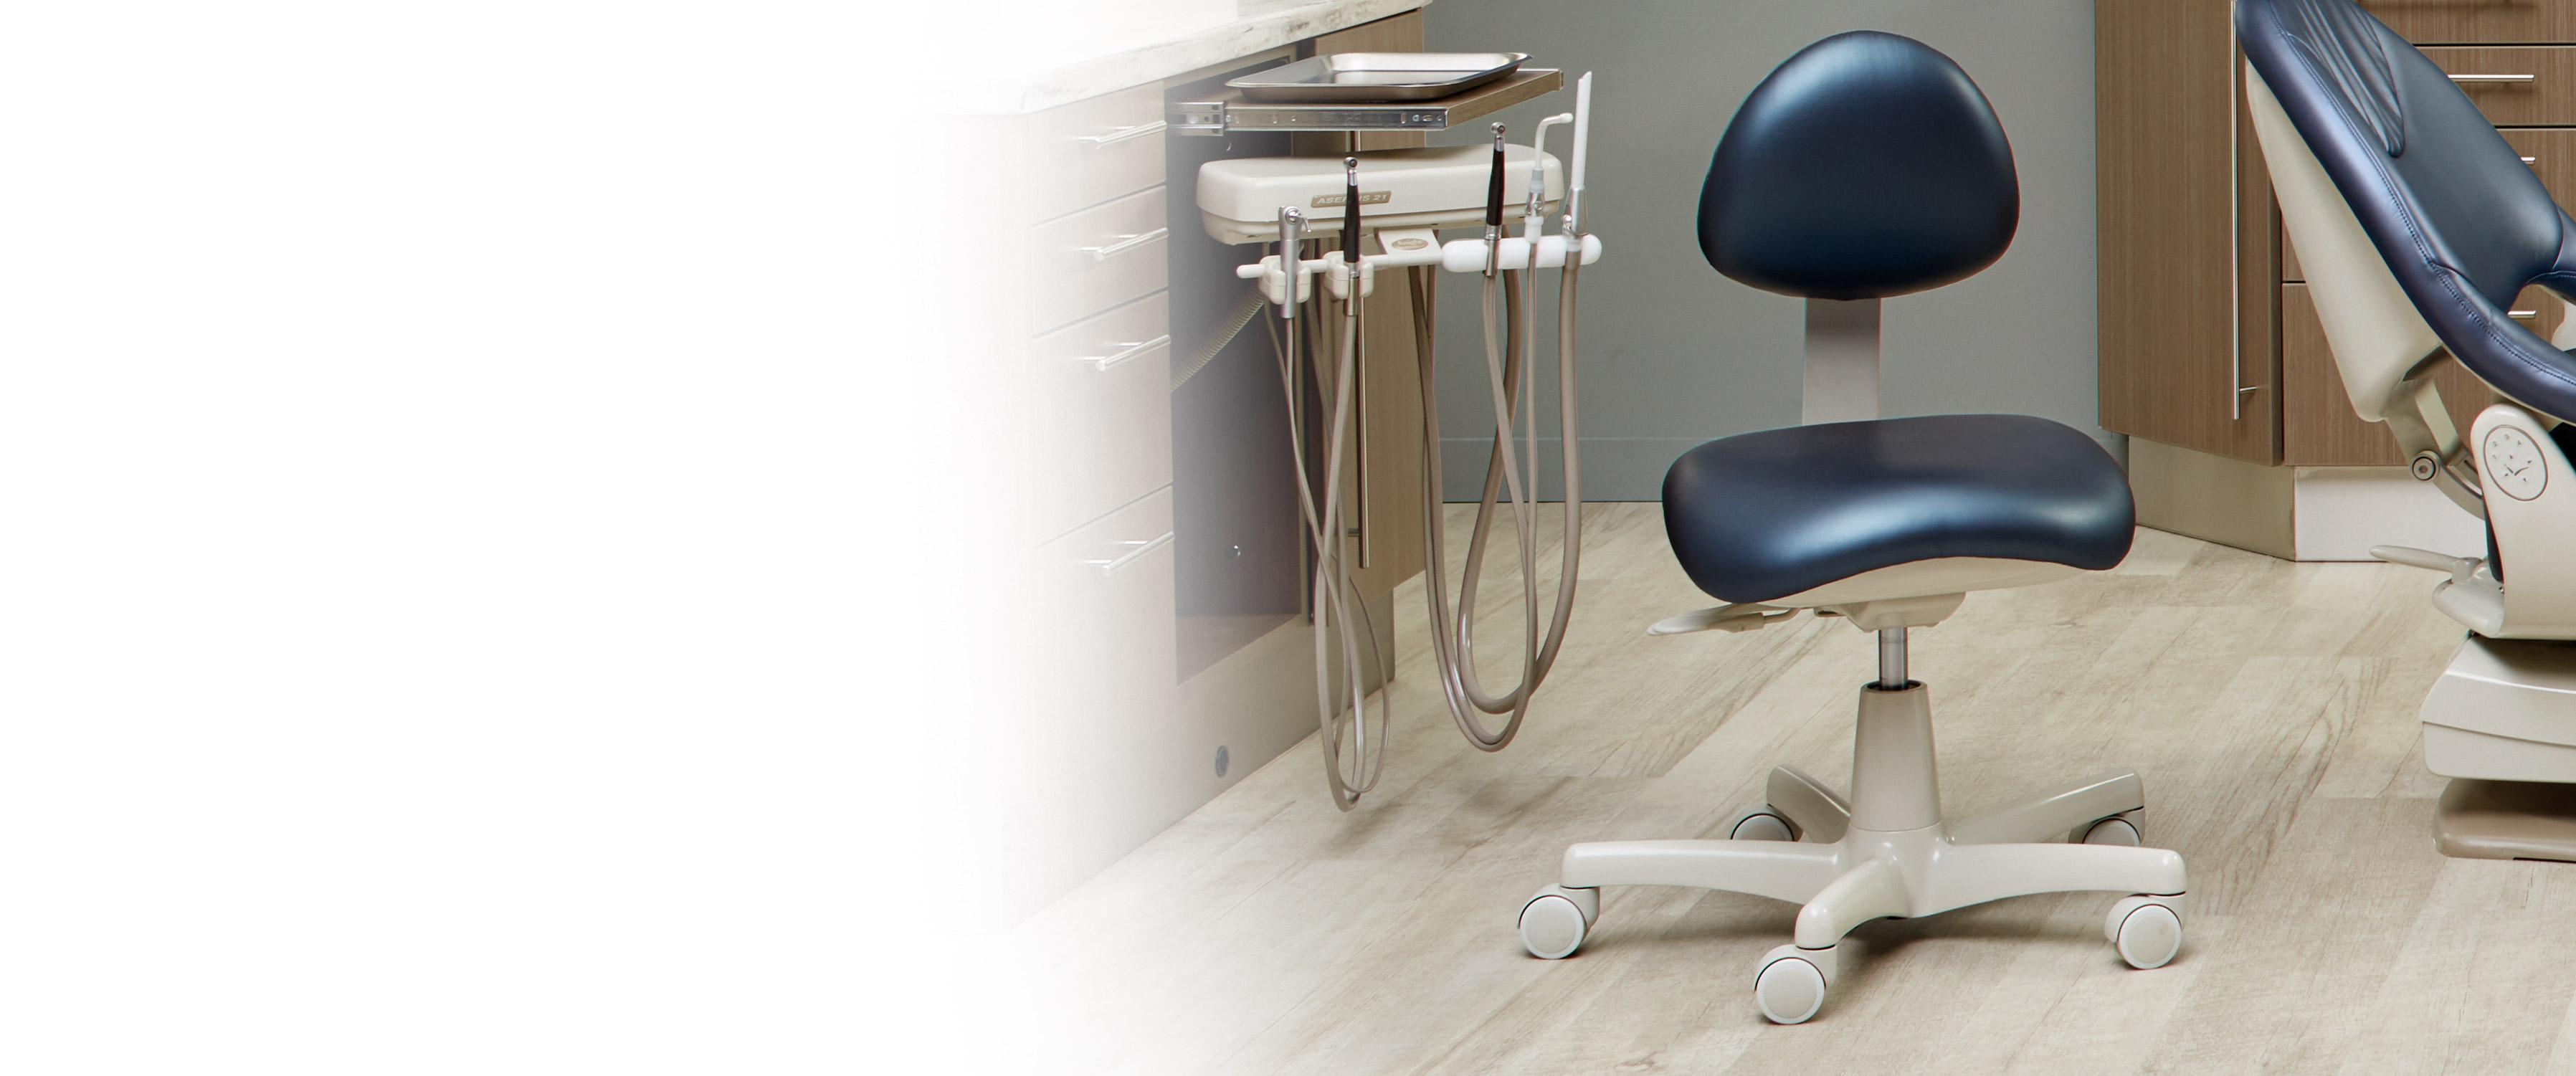 seating-header-desktop